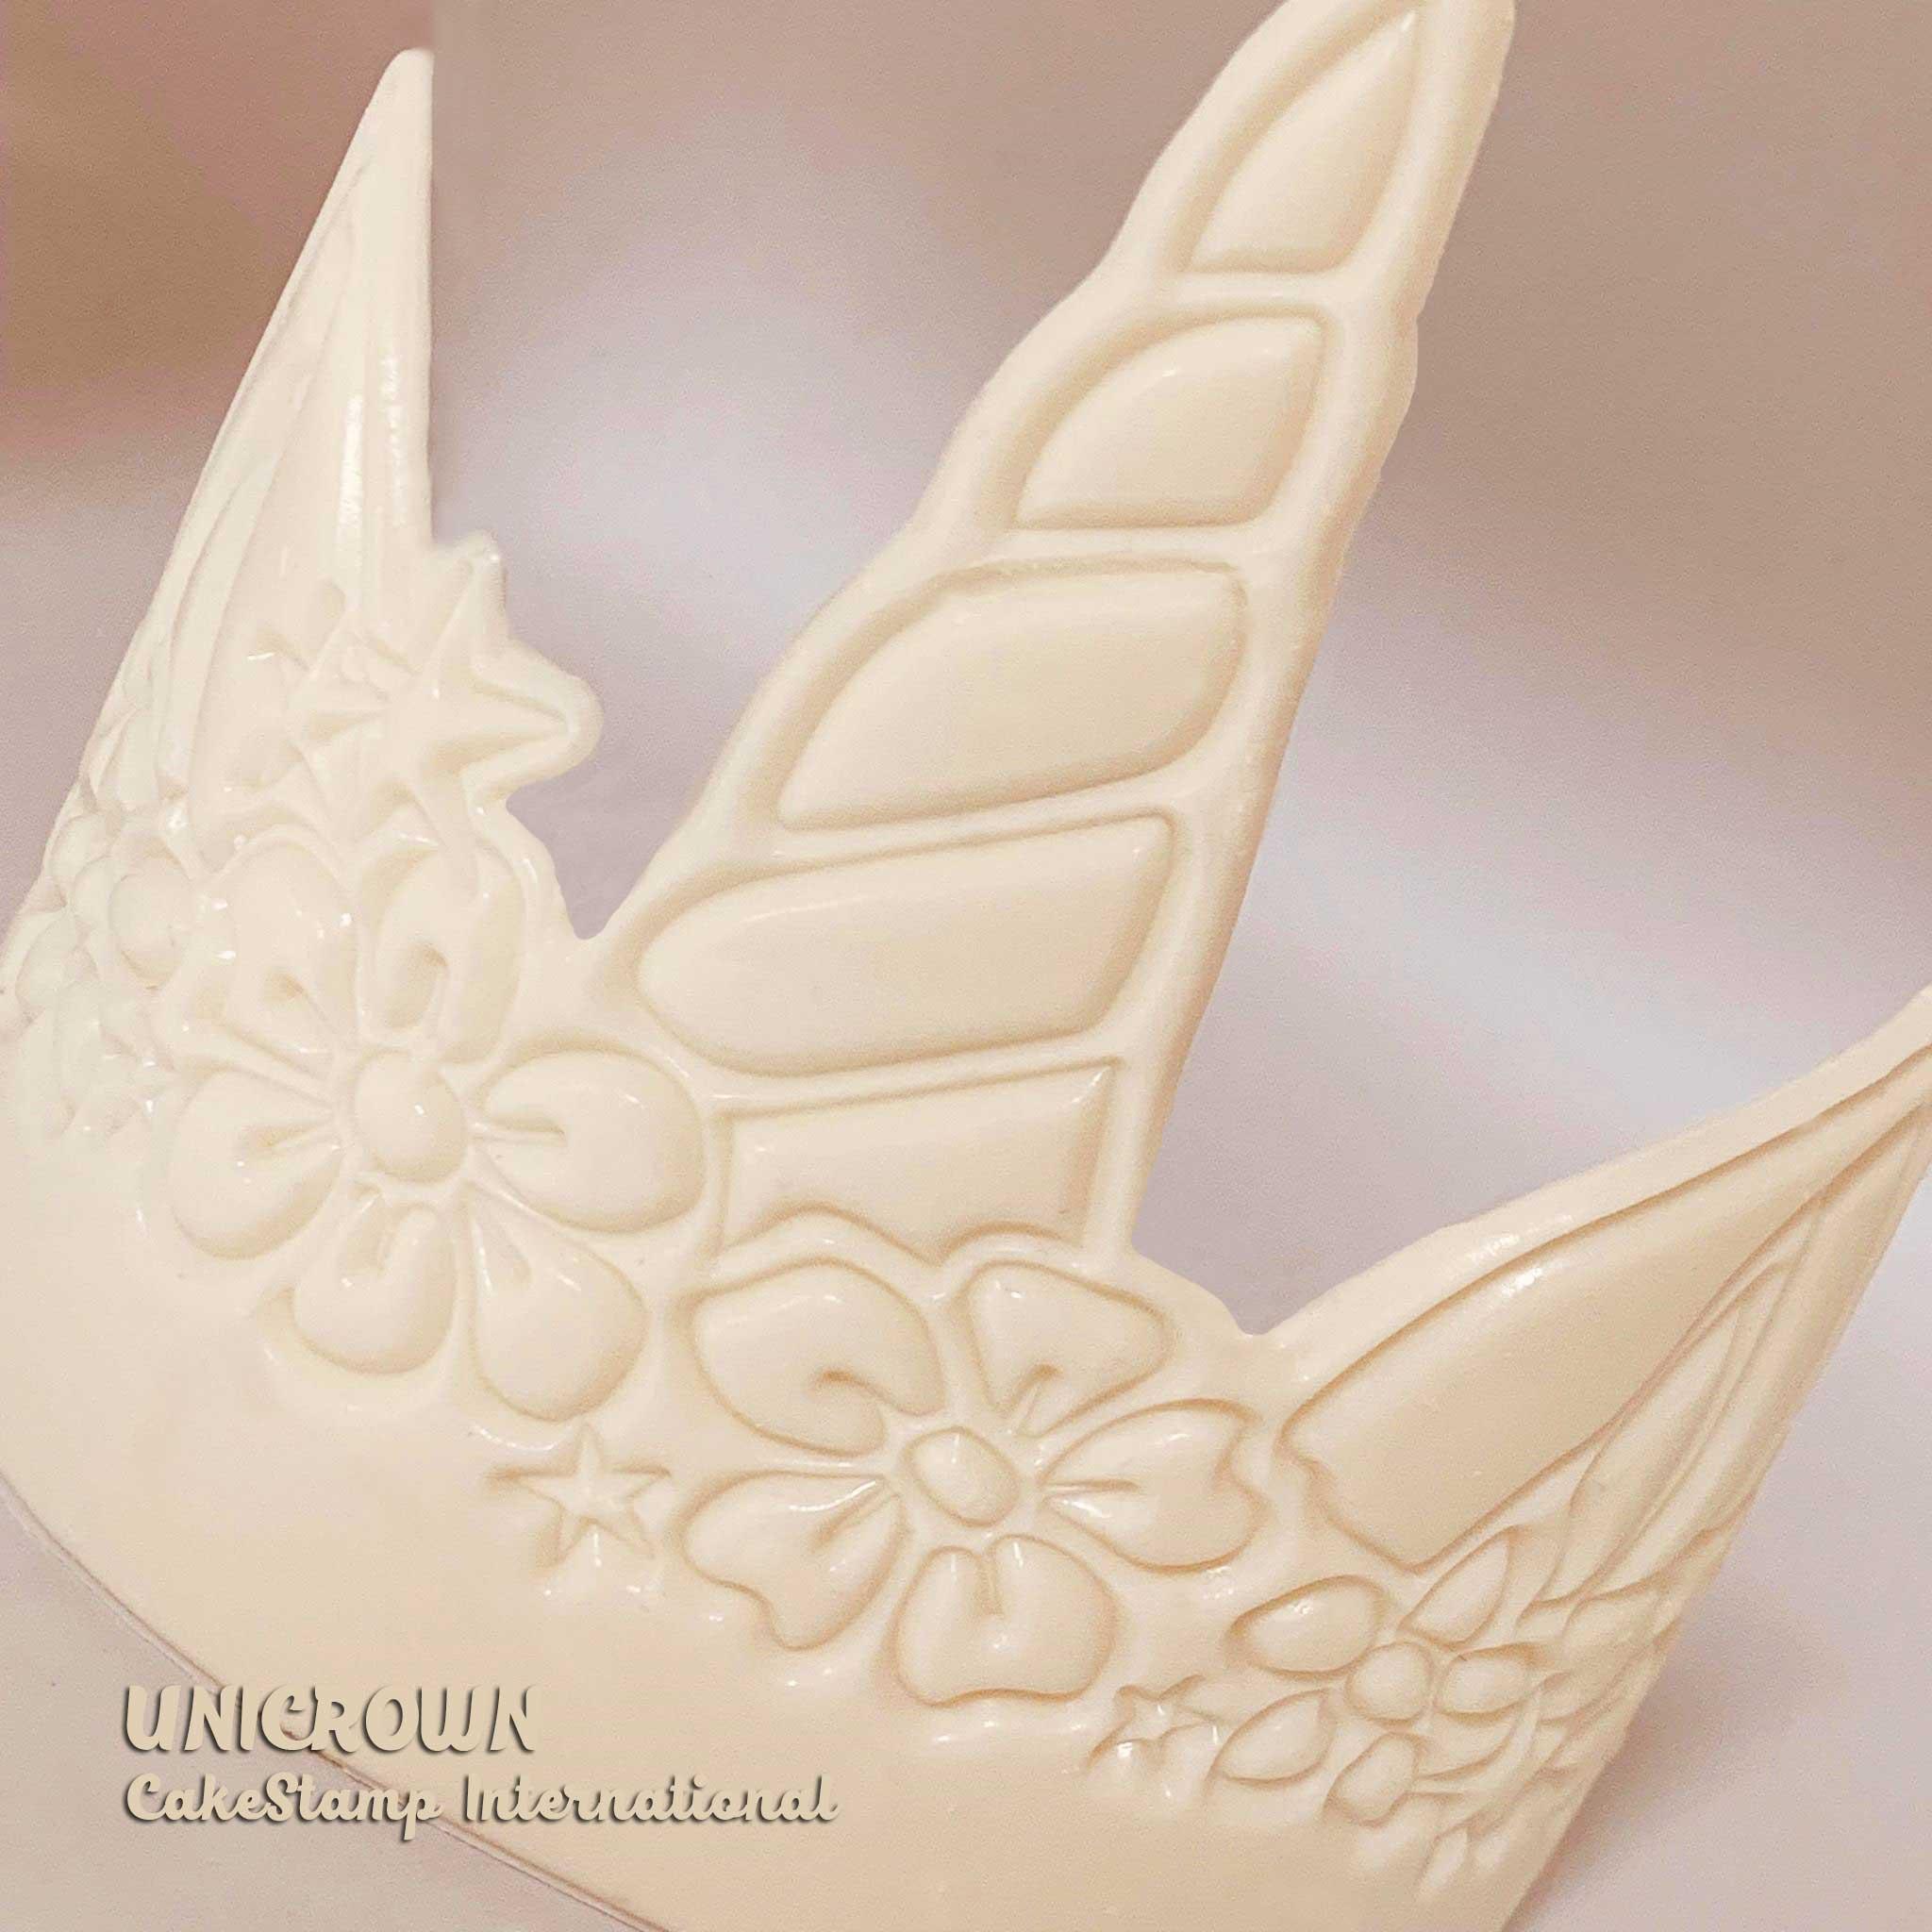 UNICORN Tiara small Chocolate mold